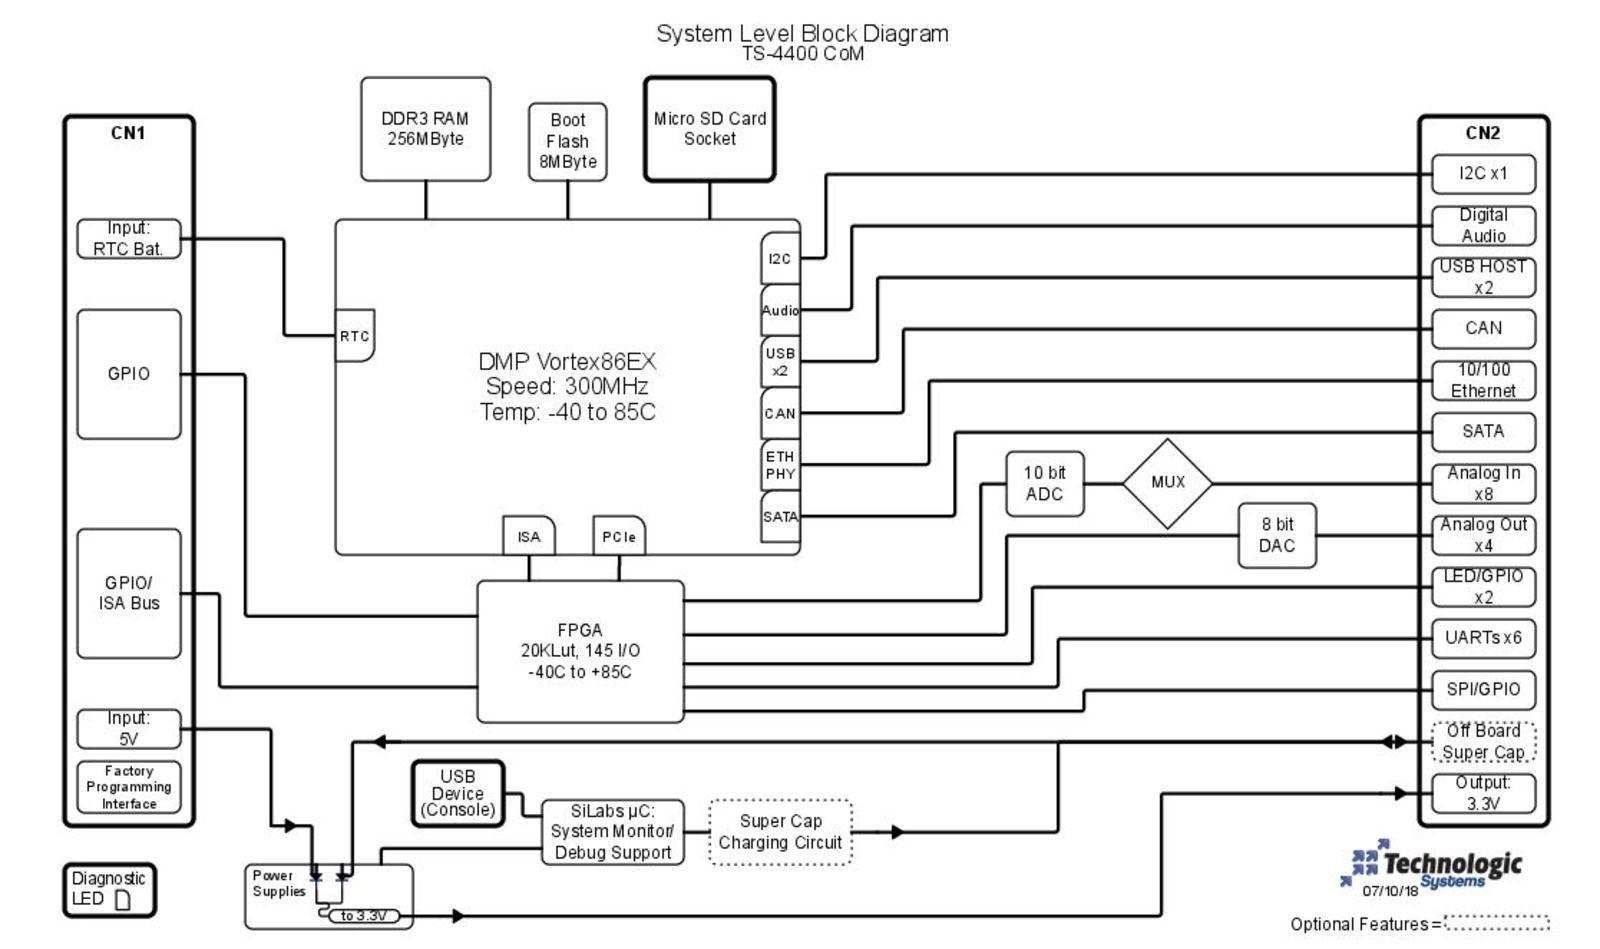 TS-4400 Block Diagram Image